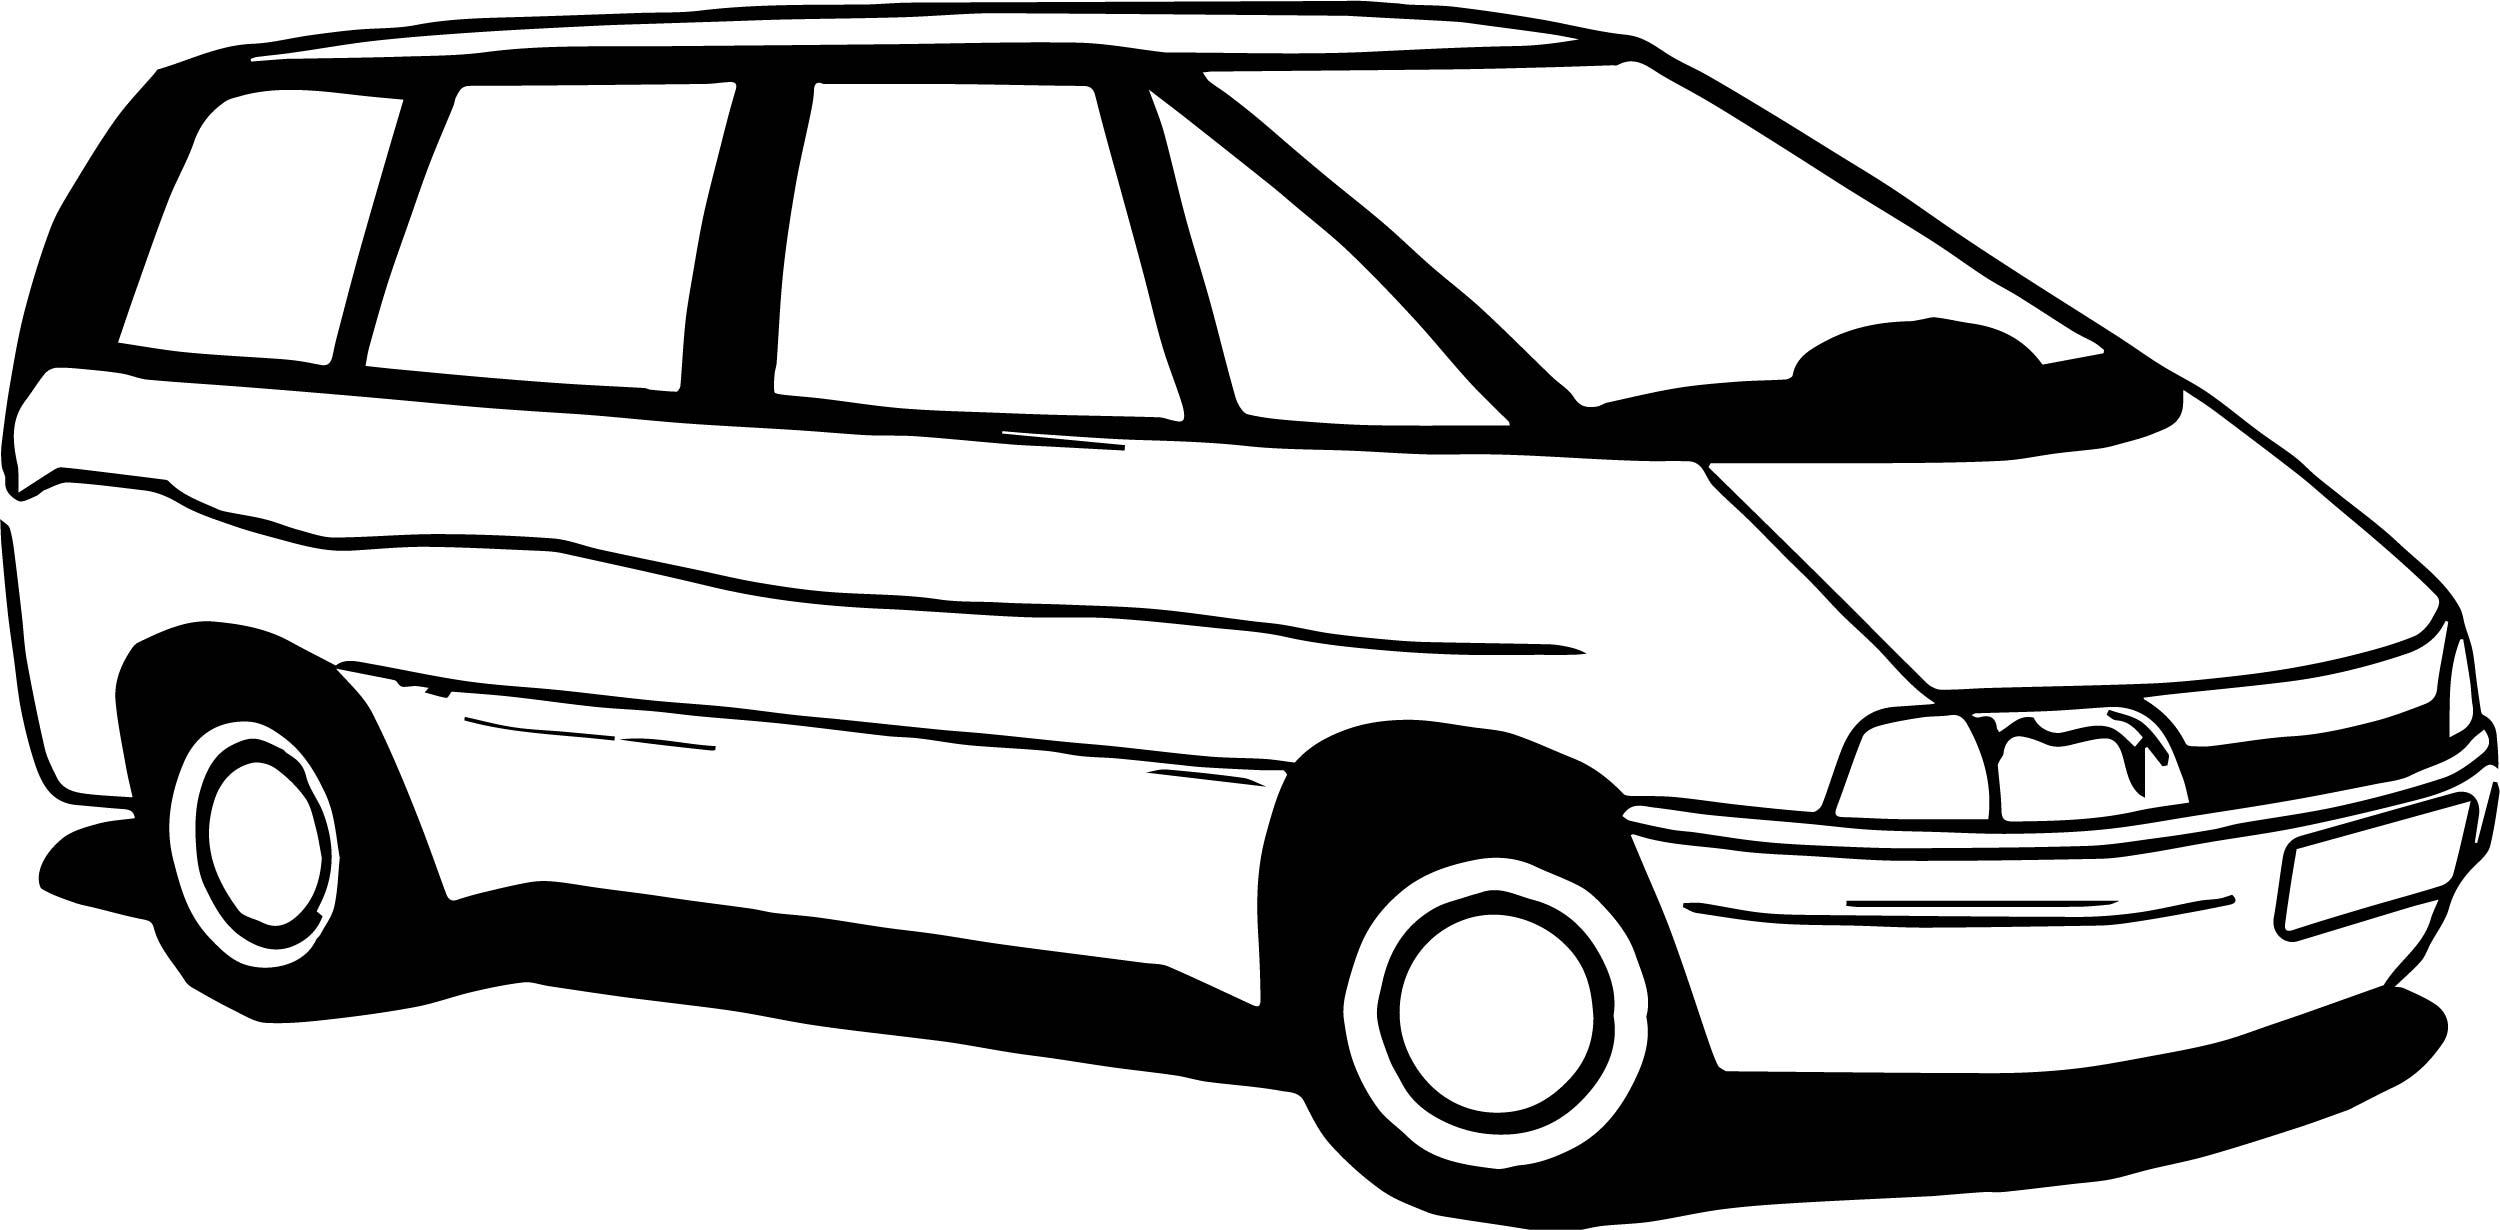 Car Minibus Coloring Page